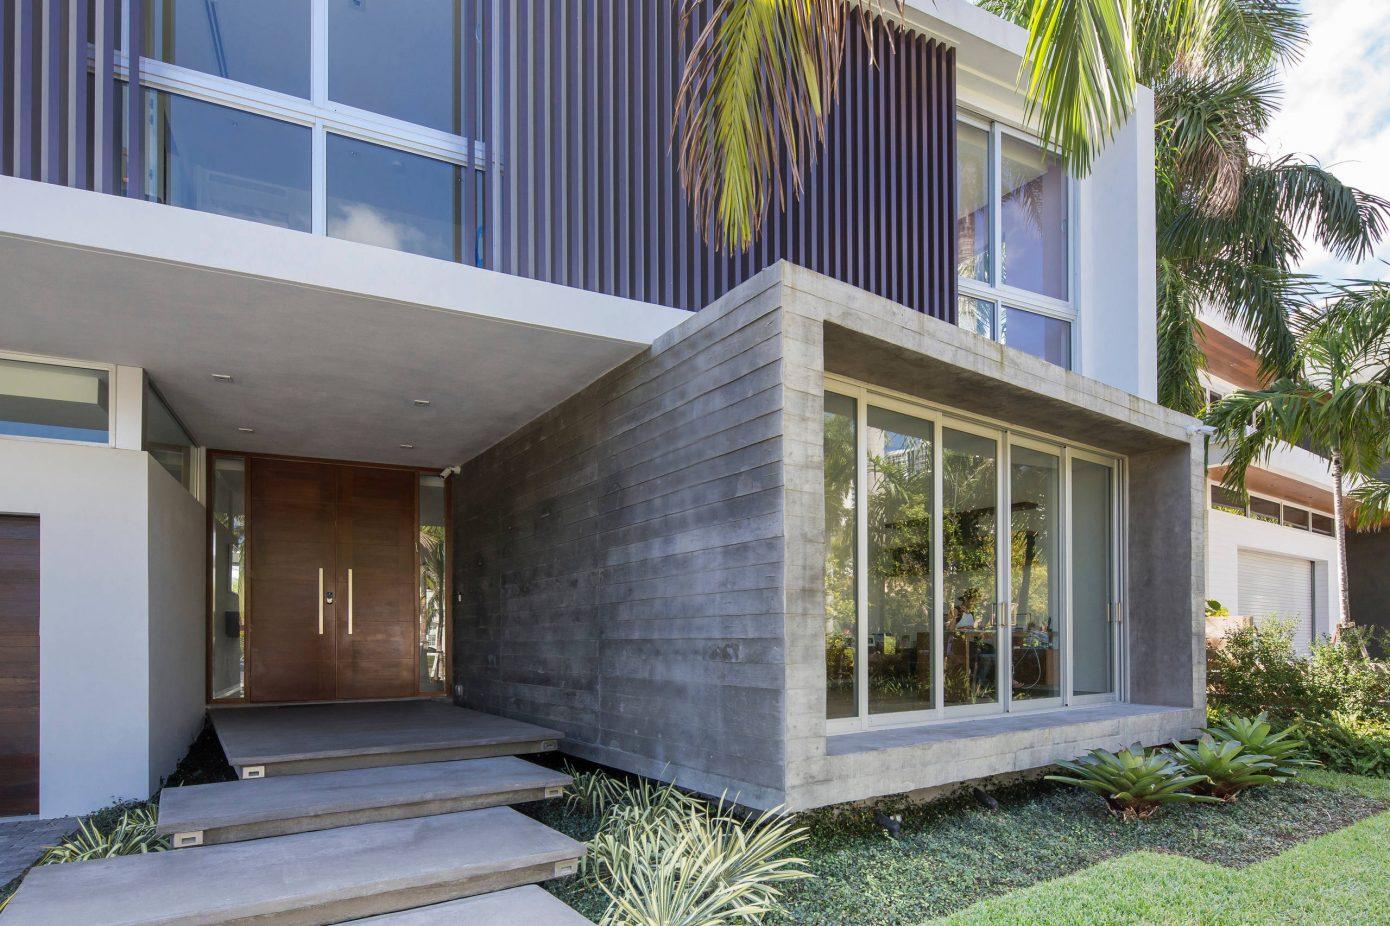 Miami Splendor - Amazing Two-story Family House - the entrance